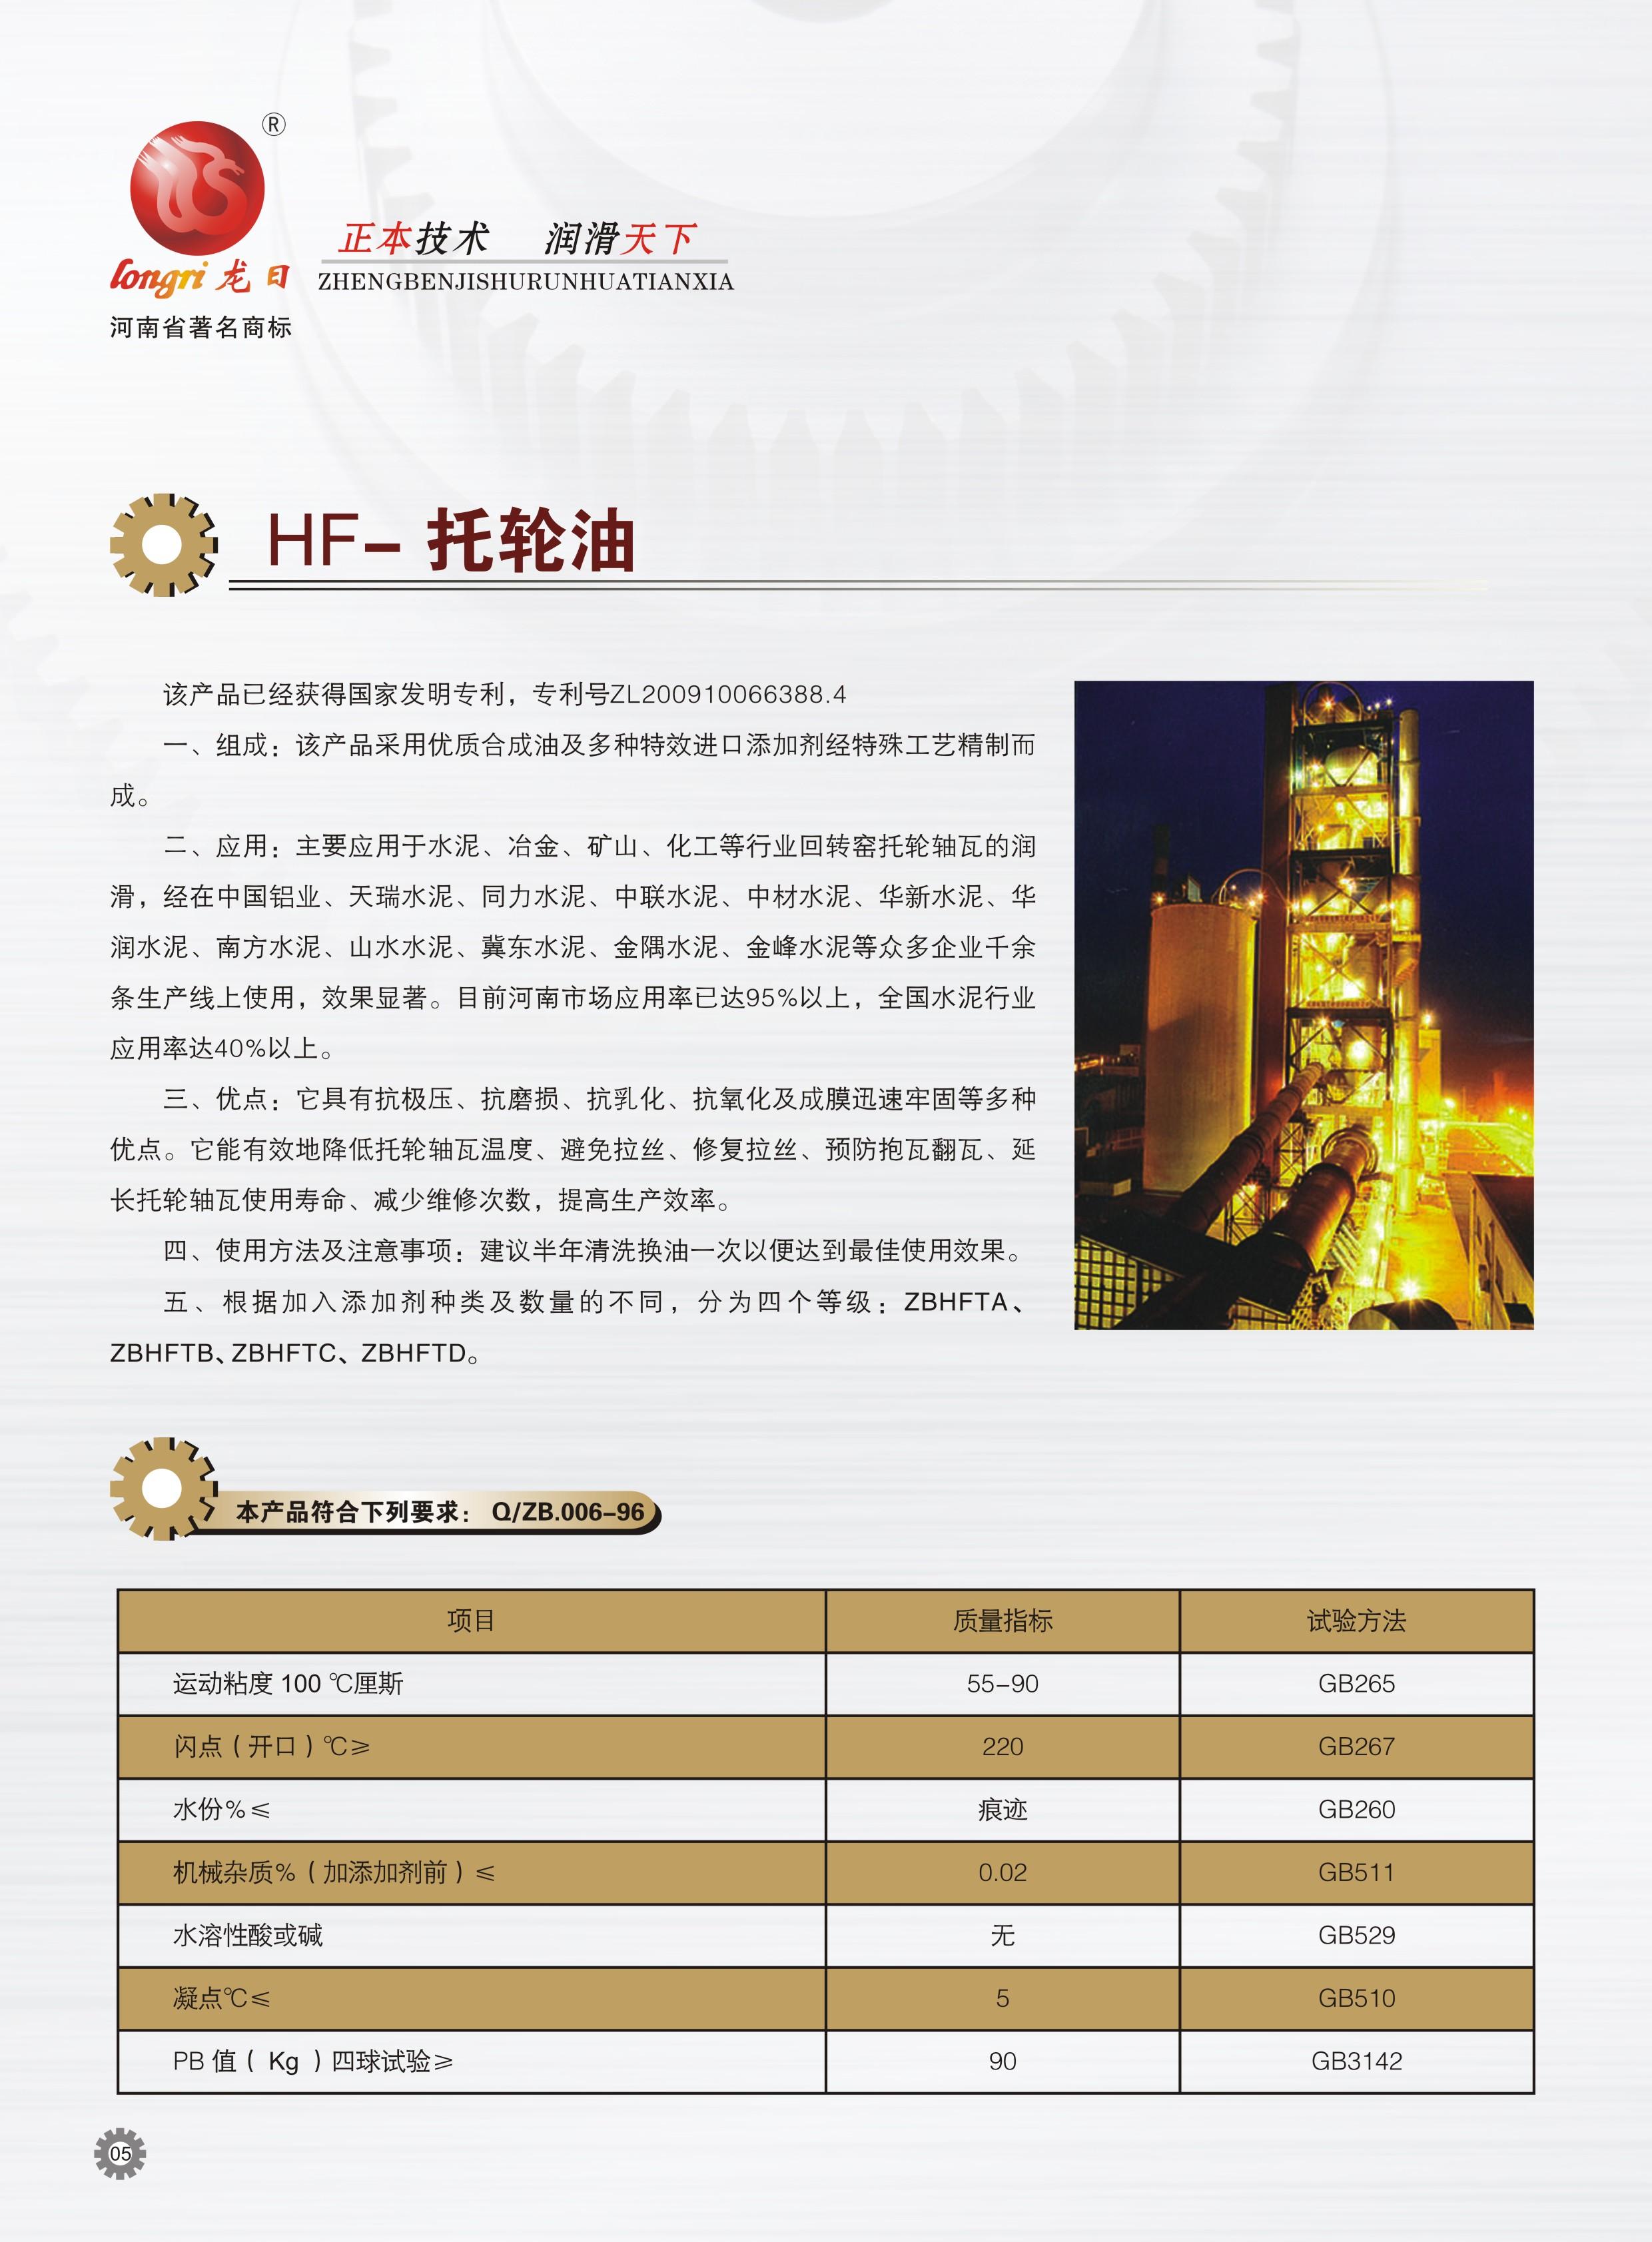 HF-拖轮油-洛阳拖轮油-偃师天霞拖轮油-拖轮油价格-润滑油作用